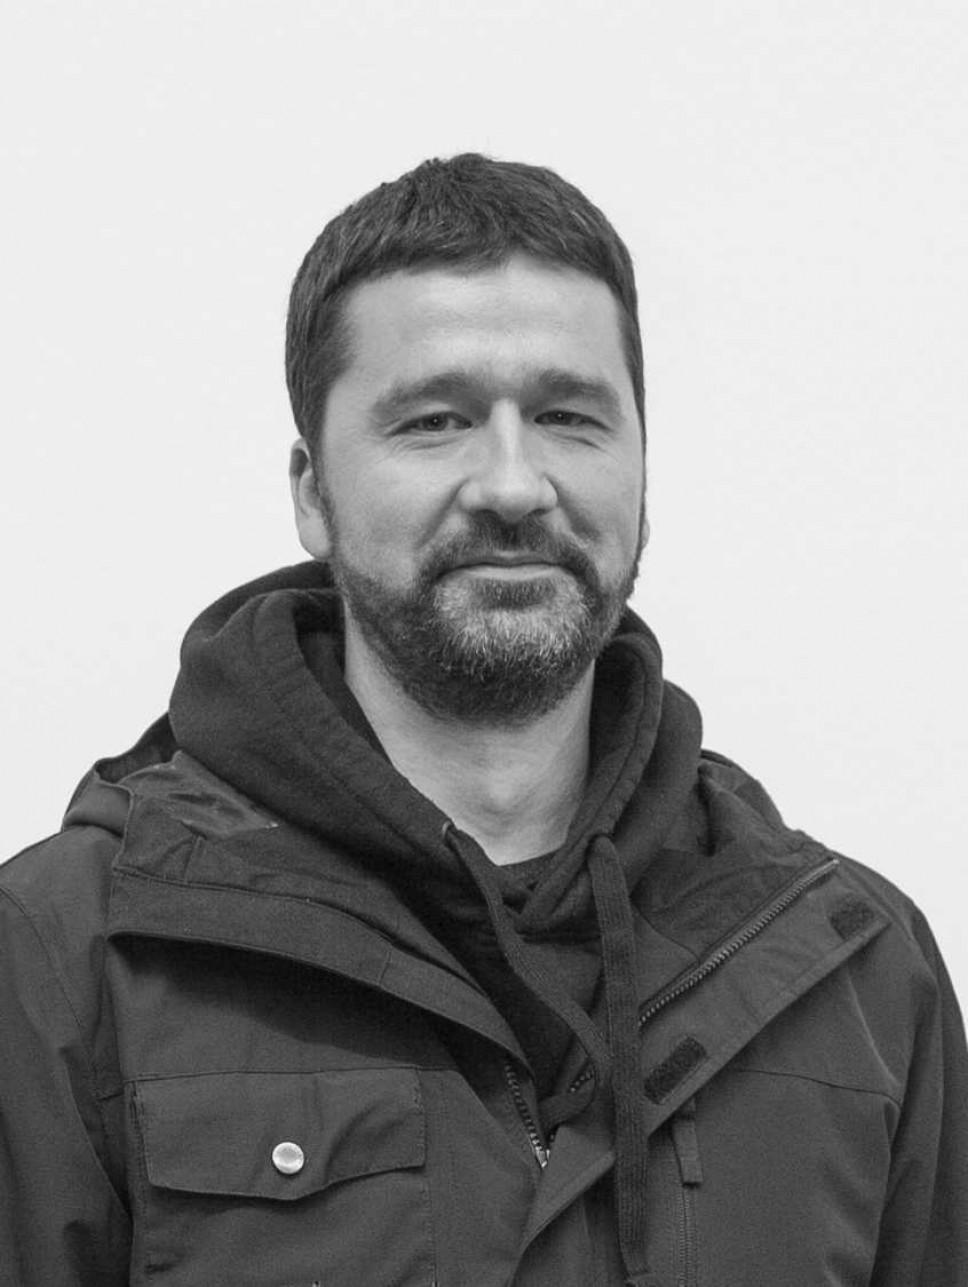 Biografija - Kojić Stevan